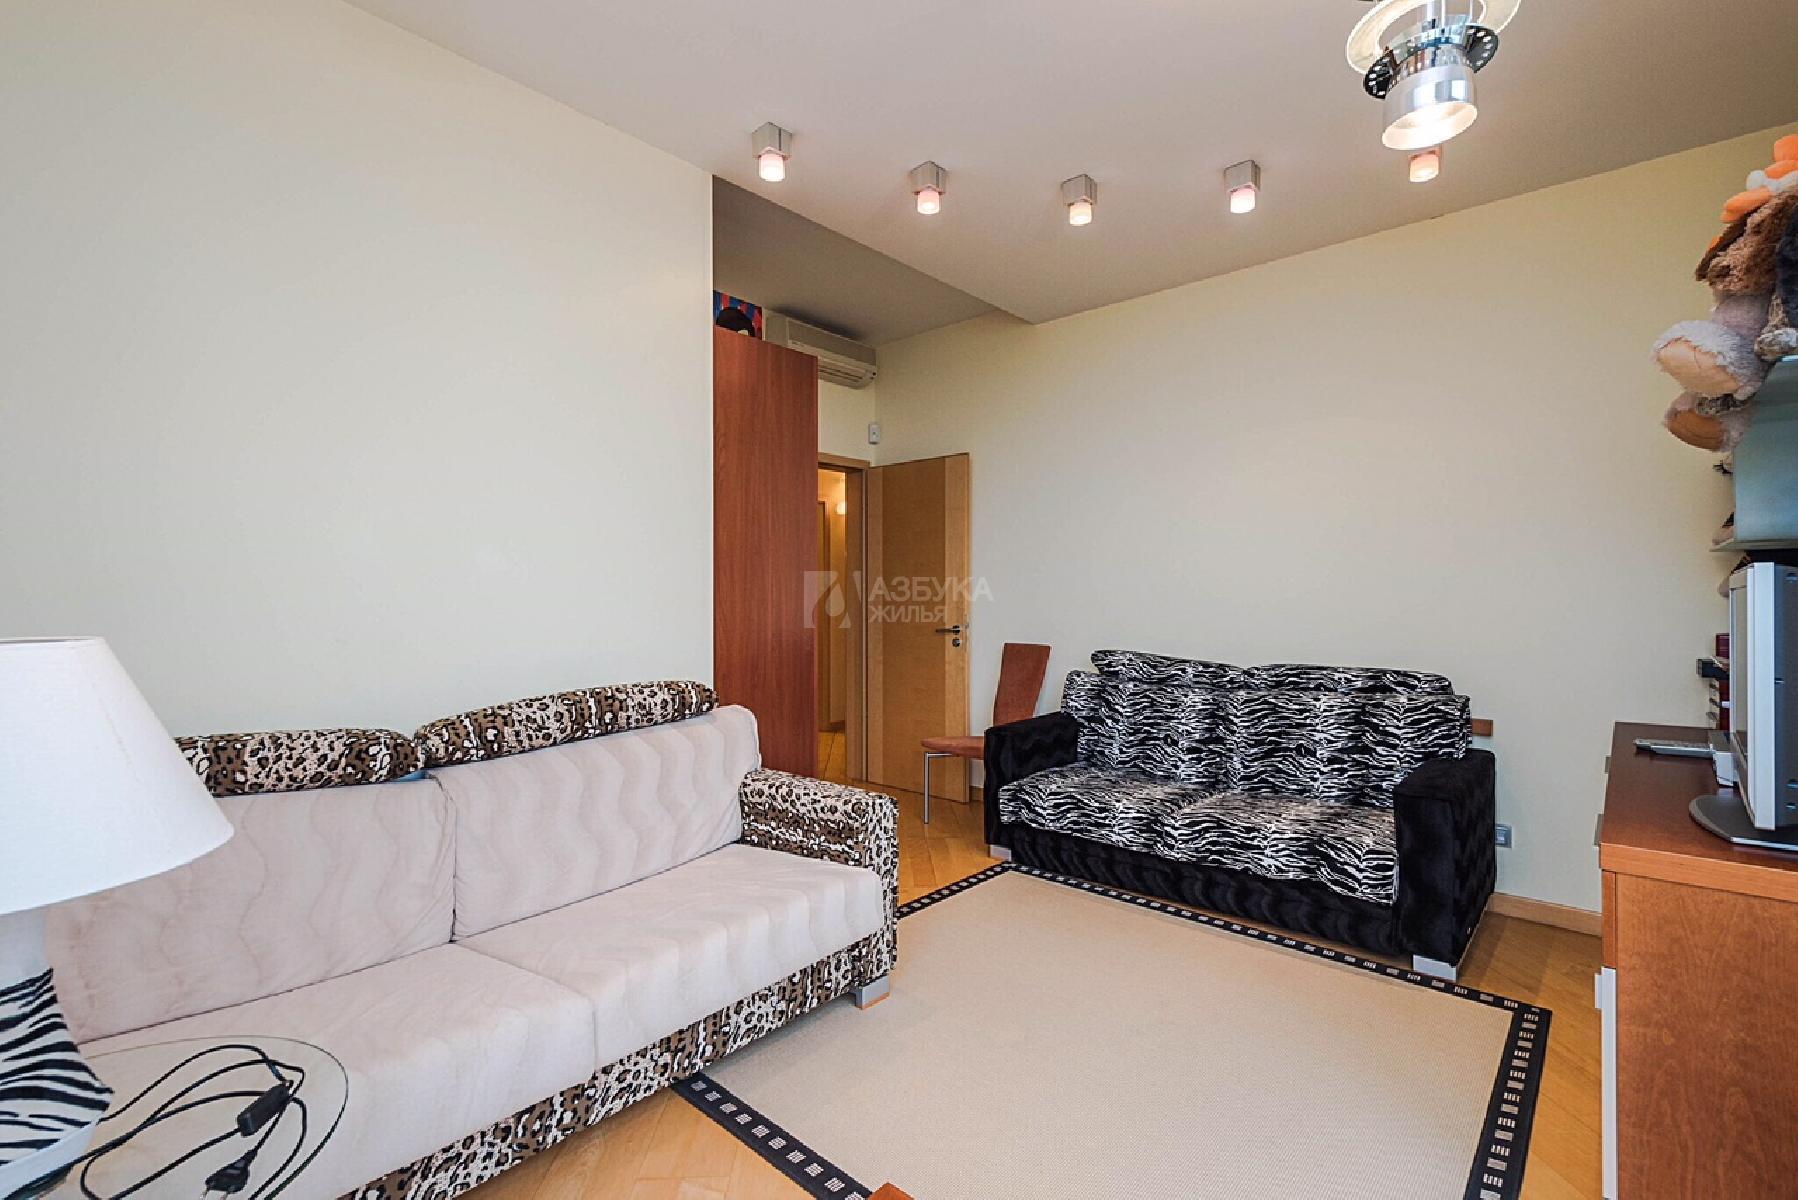 Фото №23 - 5-комнатная квартира, Москва, Авиационная улица 77, метро Щукинская